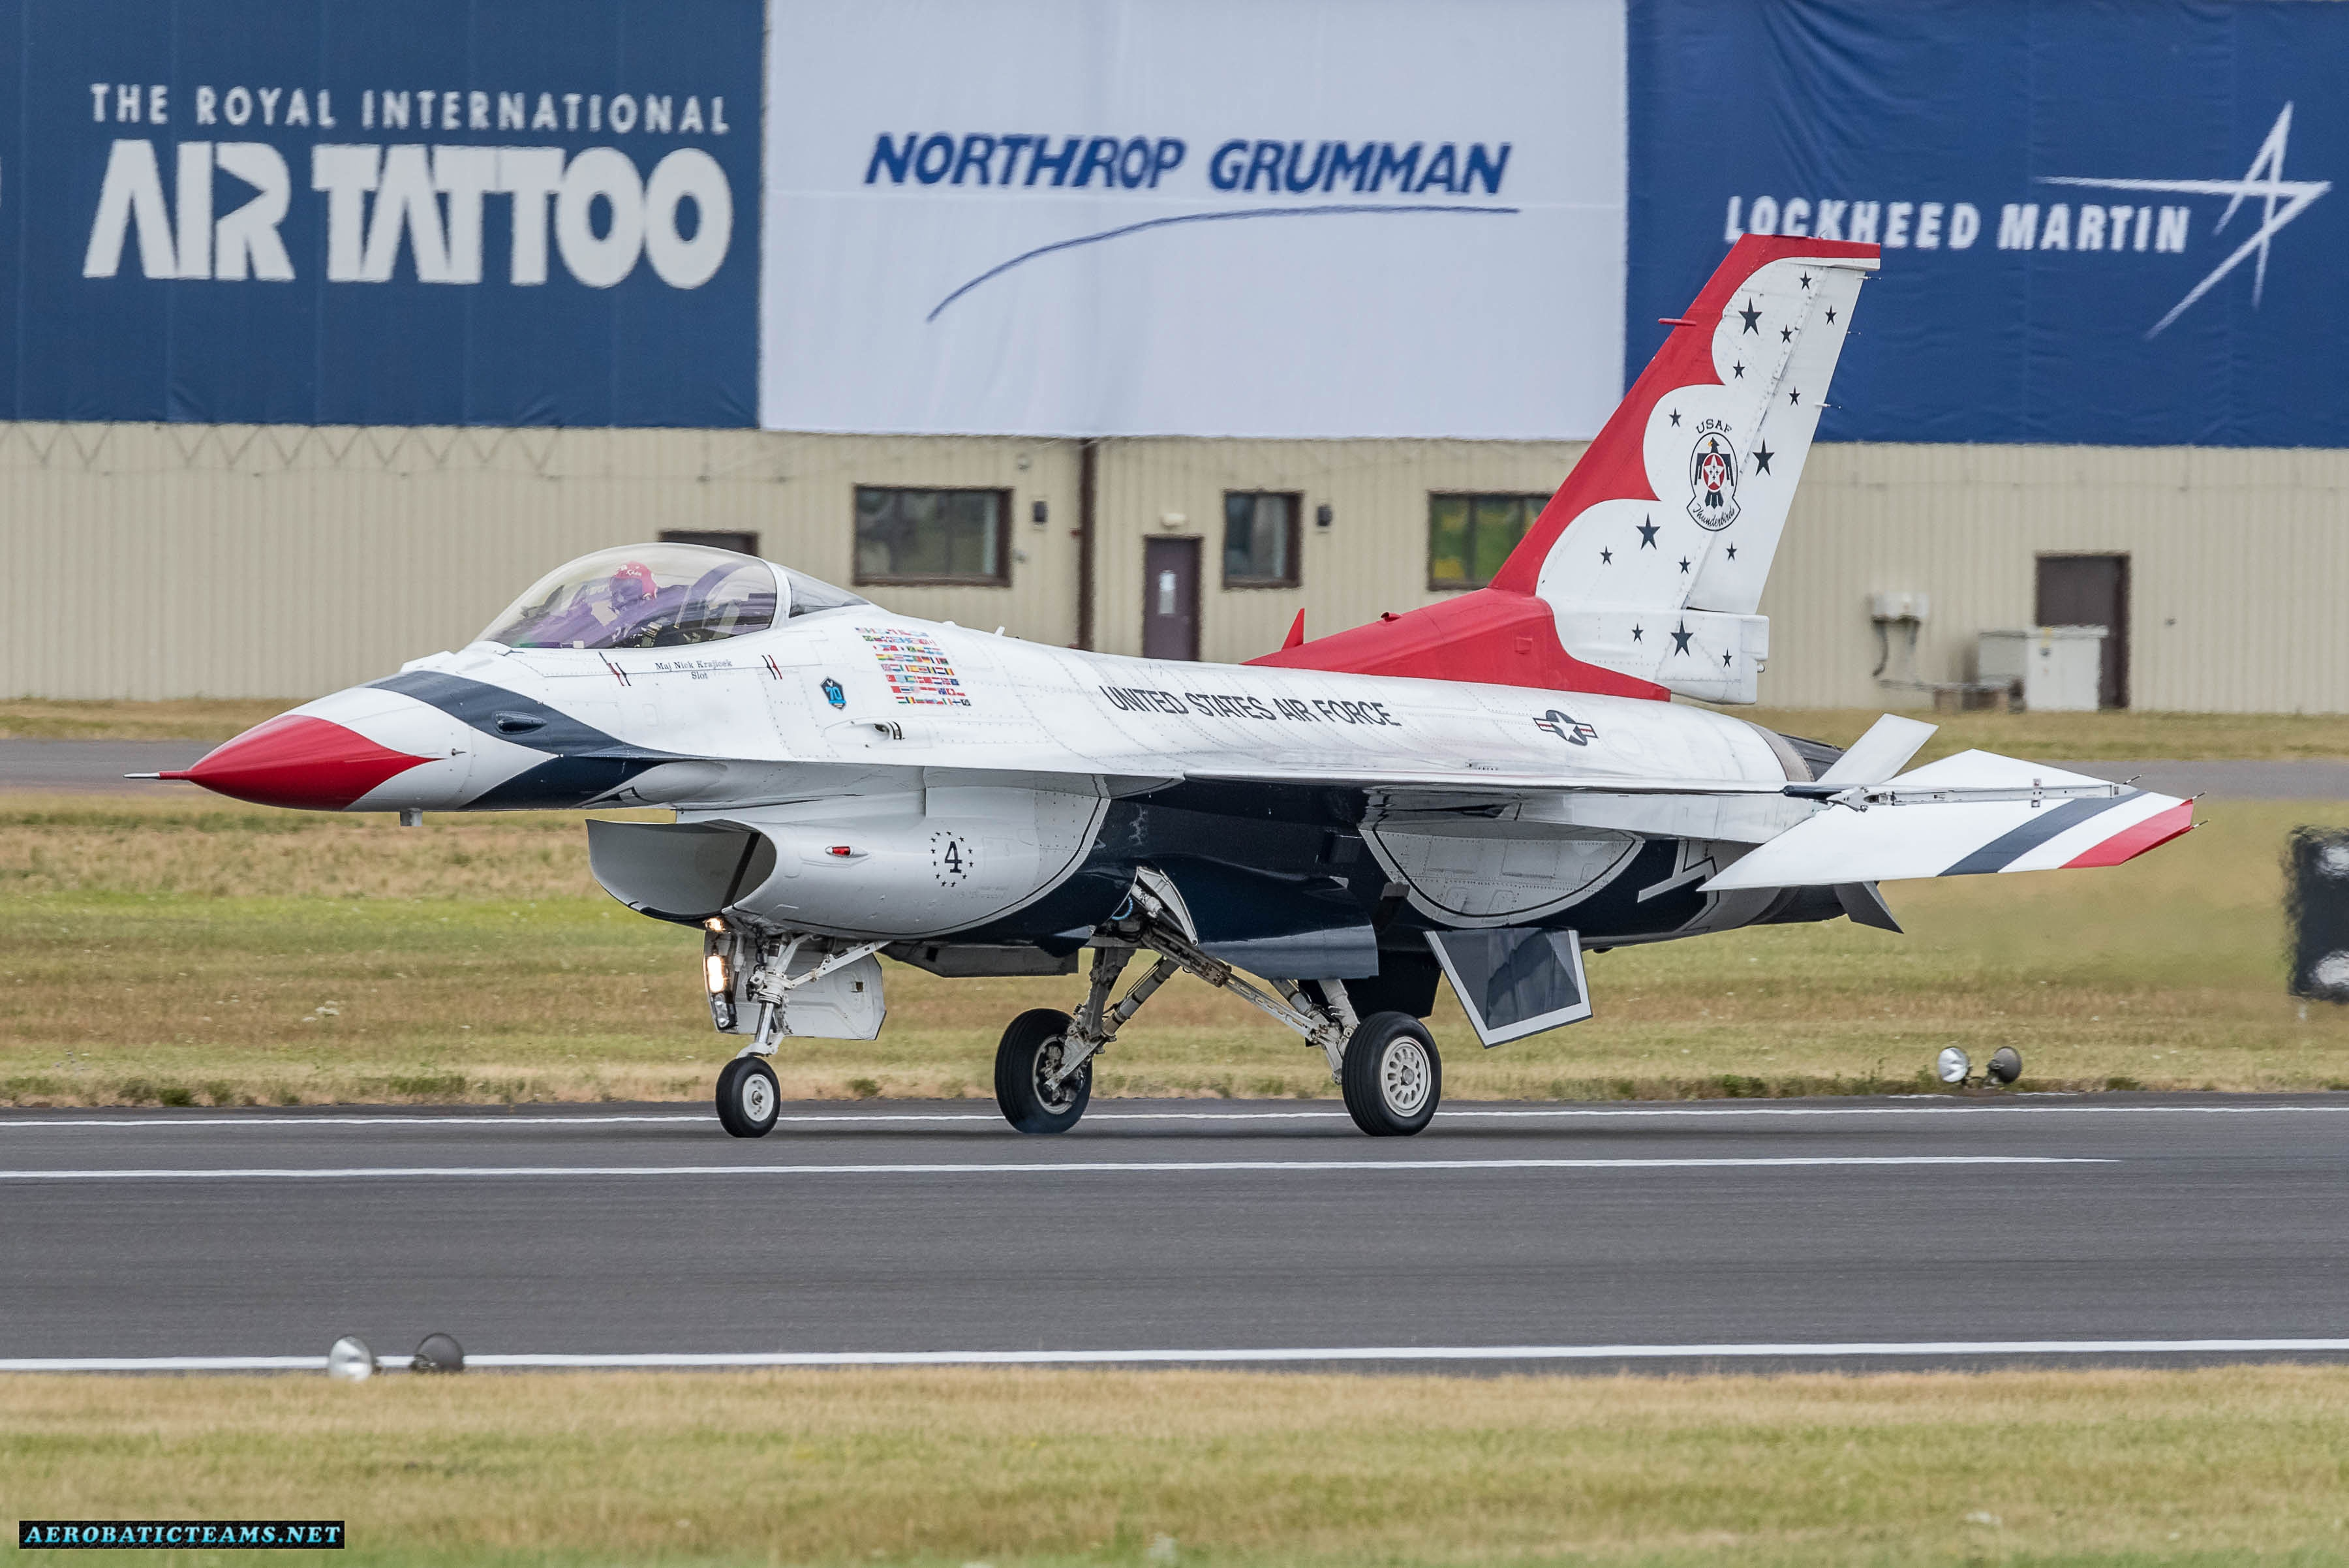 Maj. Nick Khan Krajicek during Europe visit in UK at Air Tattoo airshow, 2017